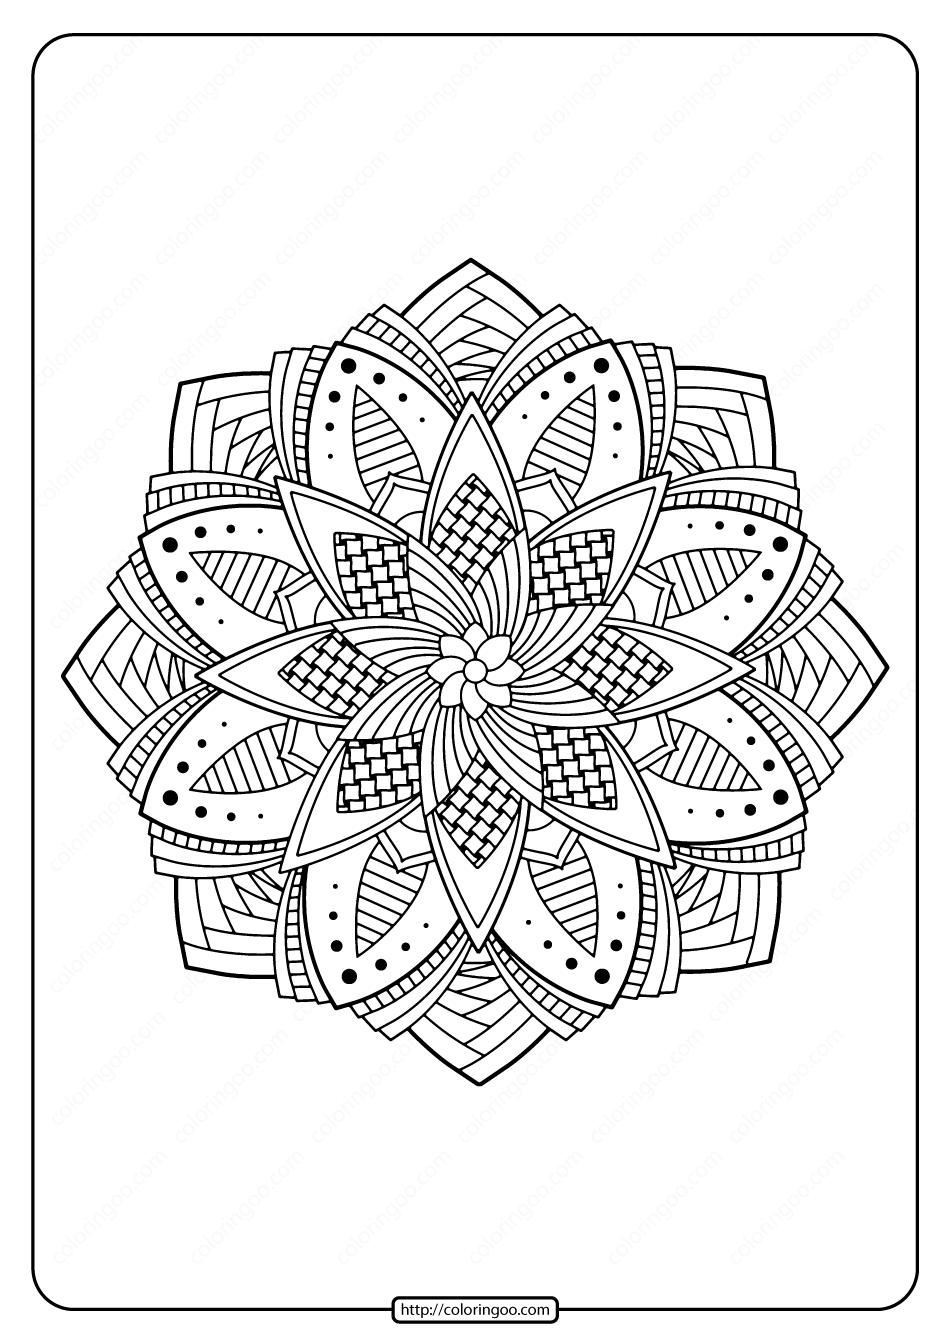 free-printable-adult-floral-mandala-coloring-page-54